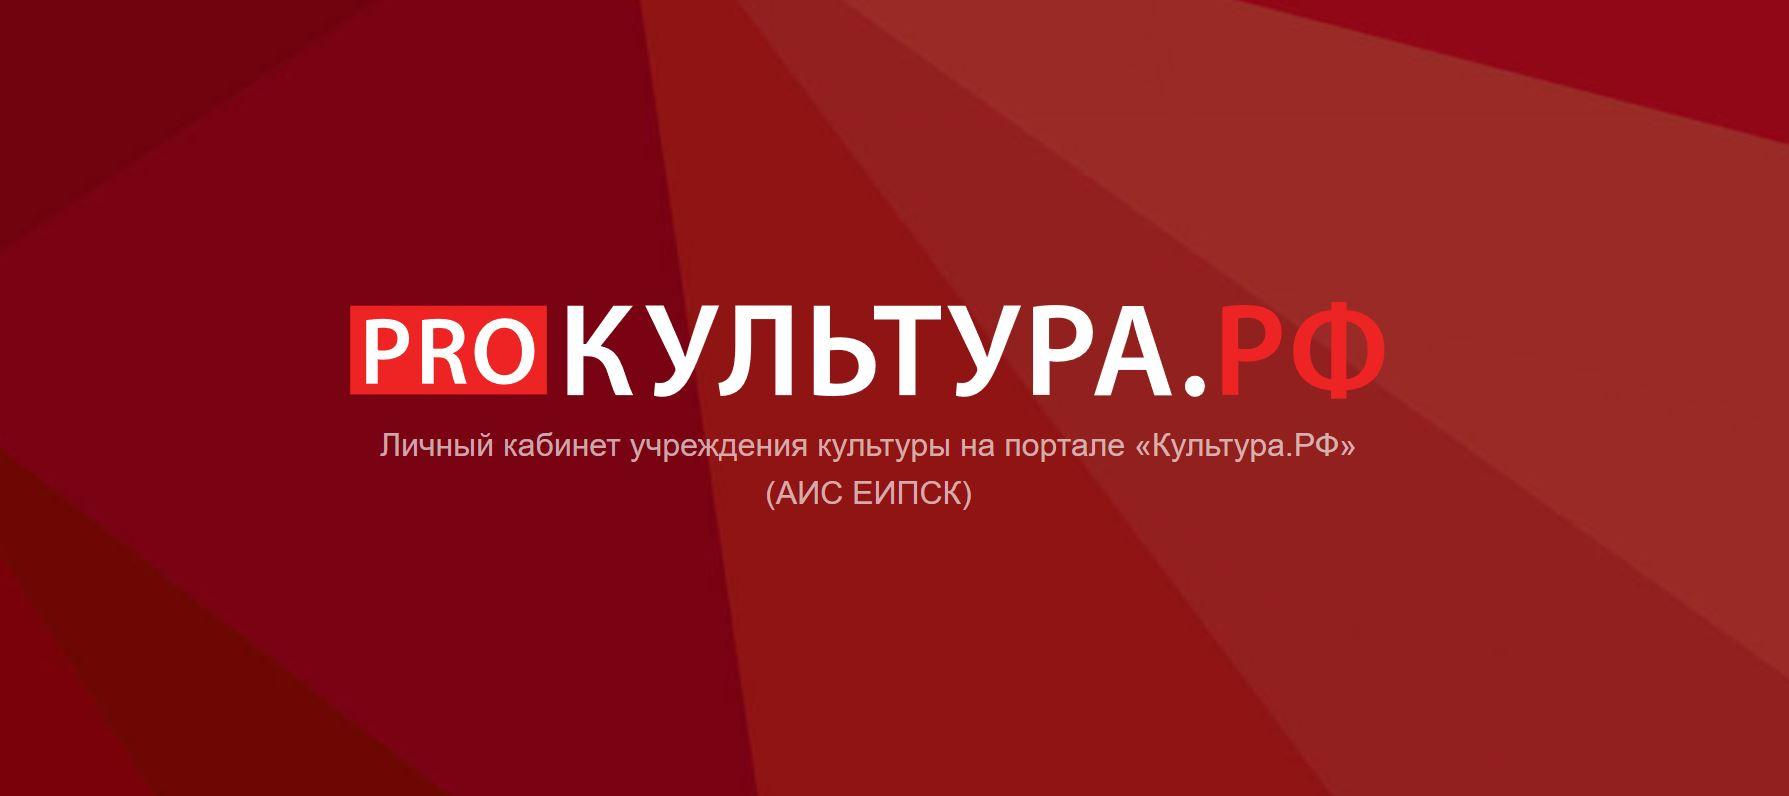 Логотип платформы PROКультура.РФ